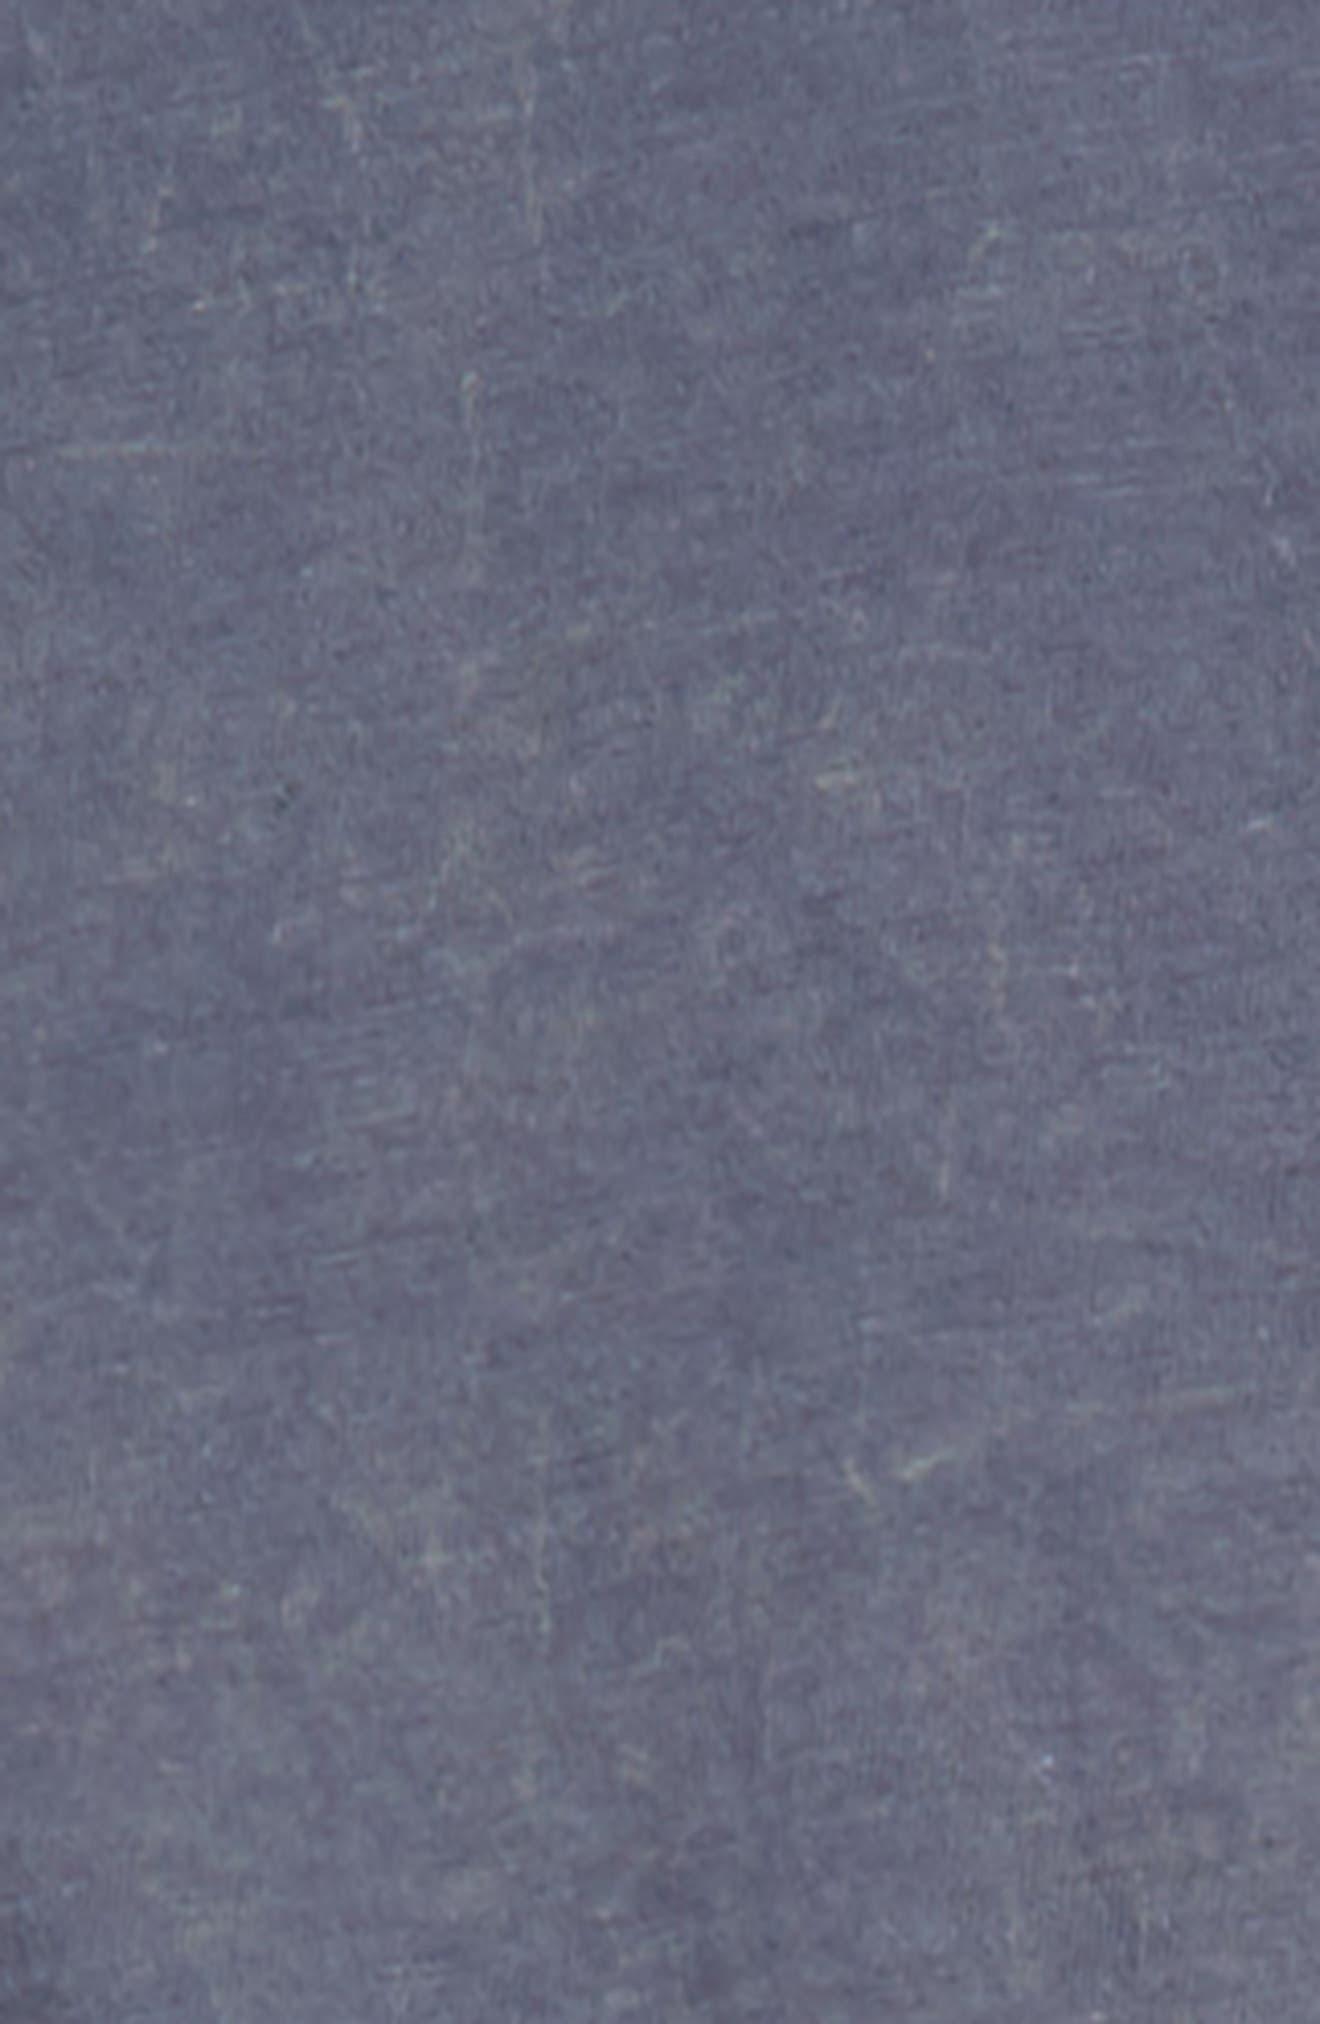 Sweatshirt & Leggings Set,                             Alternate thumbnail 2, color,                             460